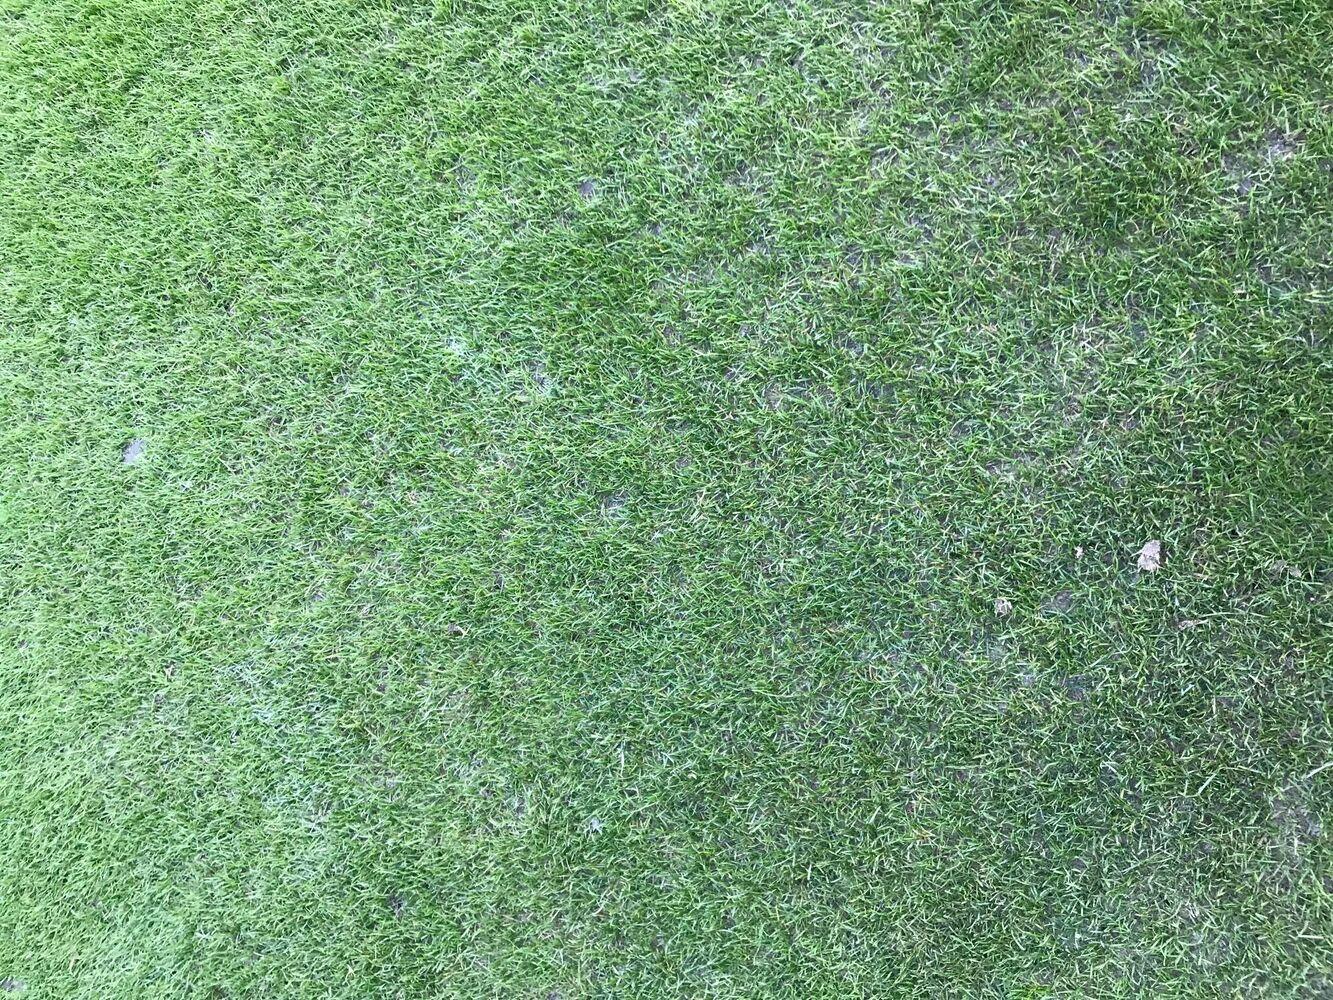 CASE STUDY: LED lighting stadium grass at football club NAC Breda